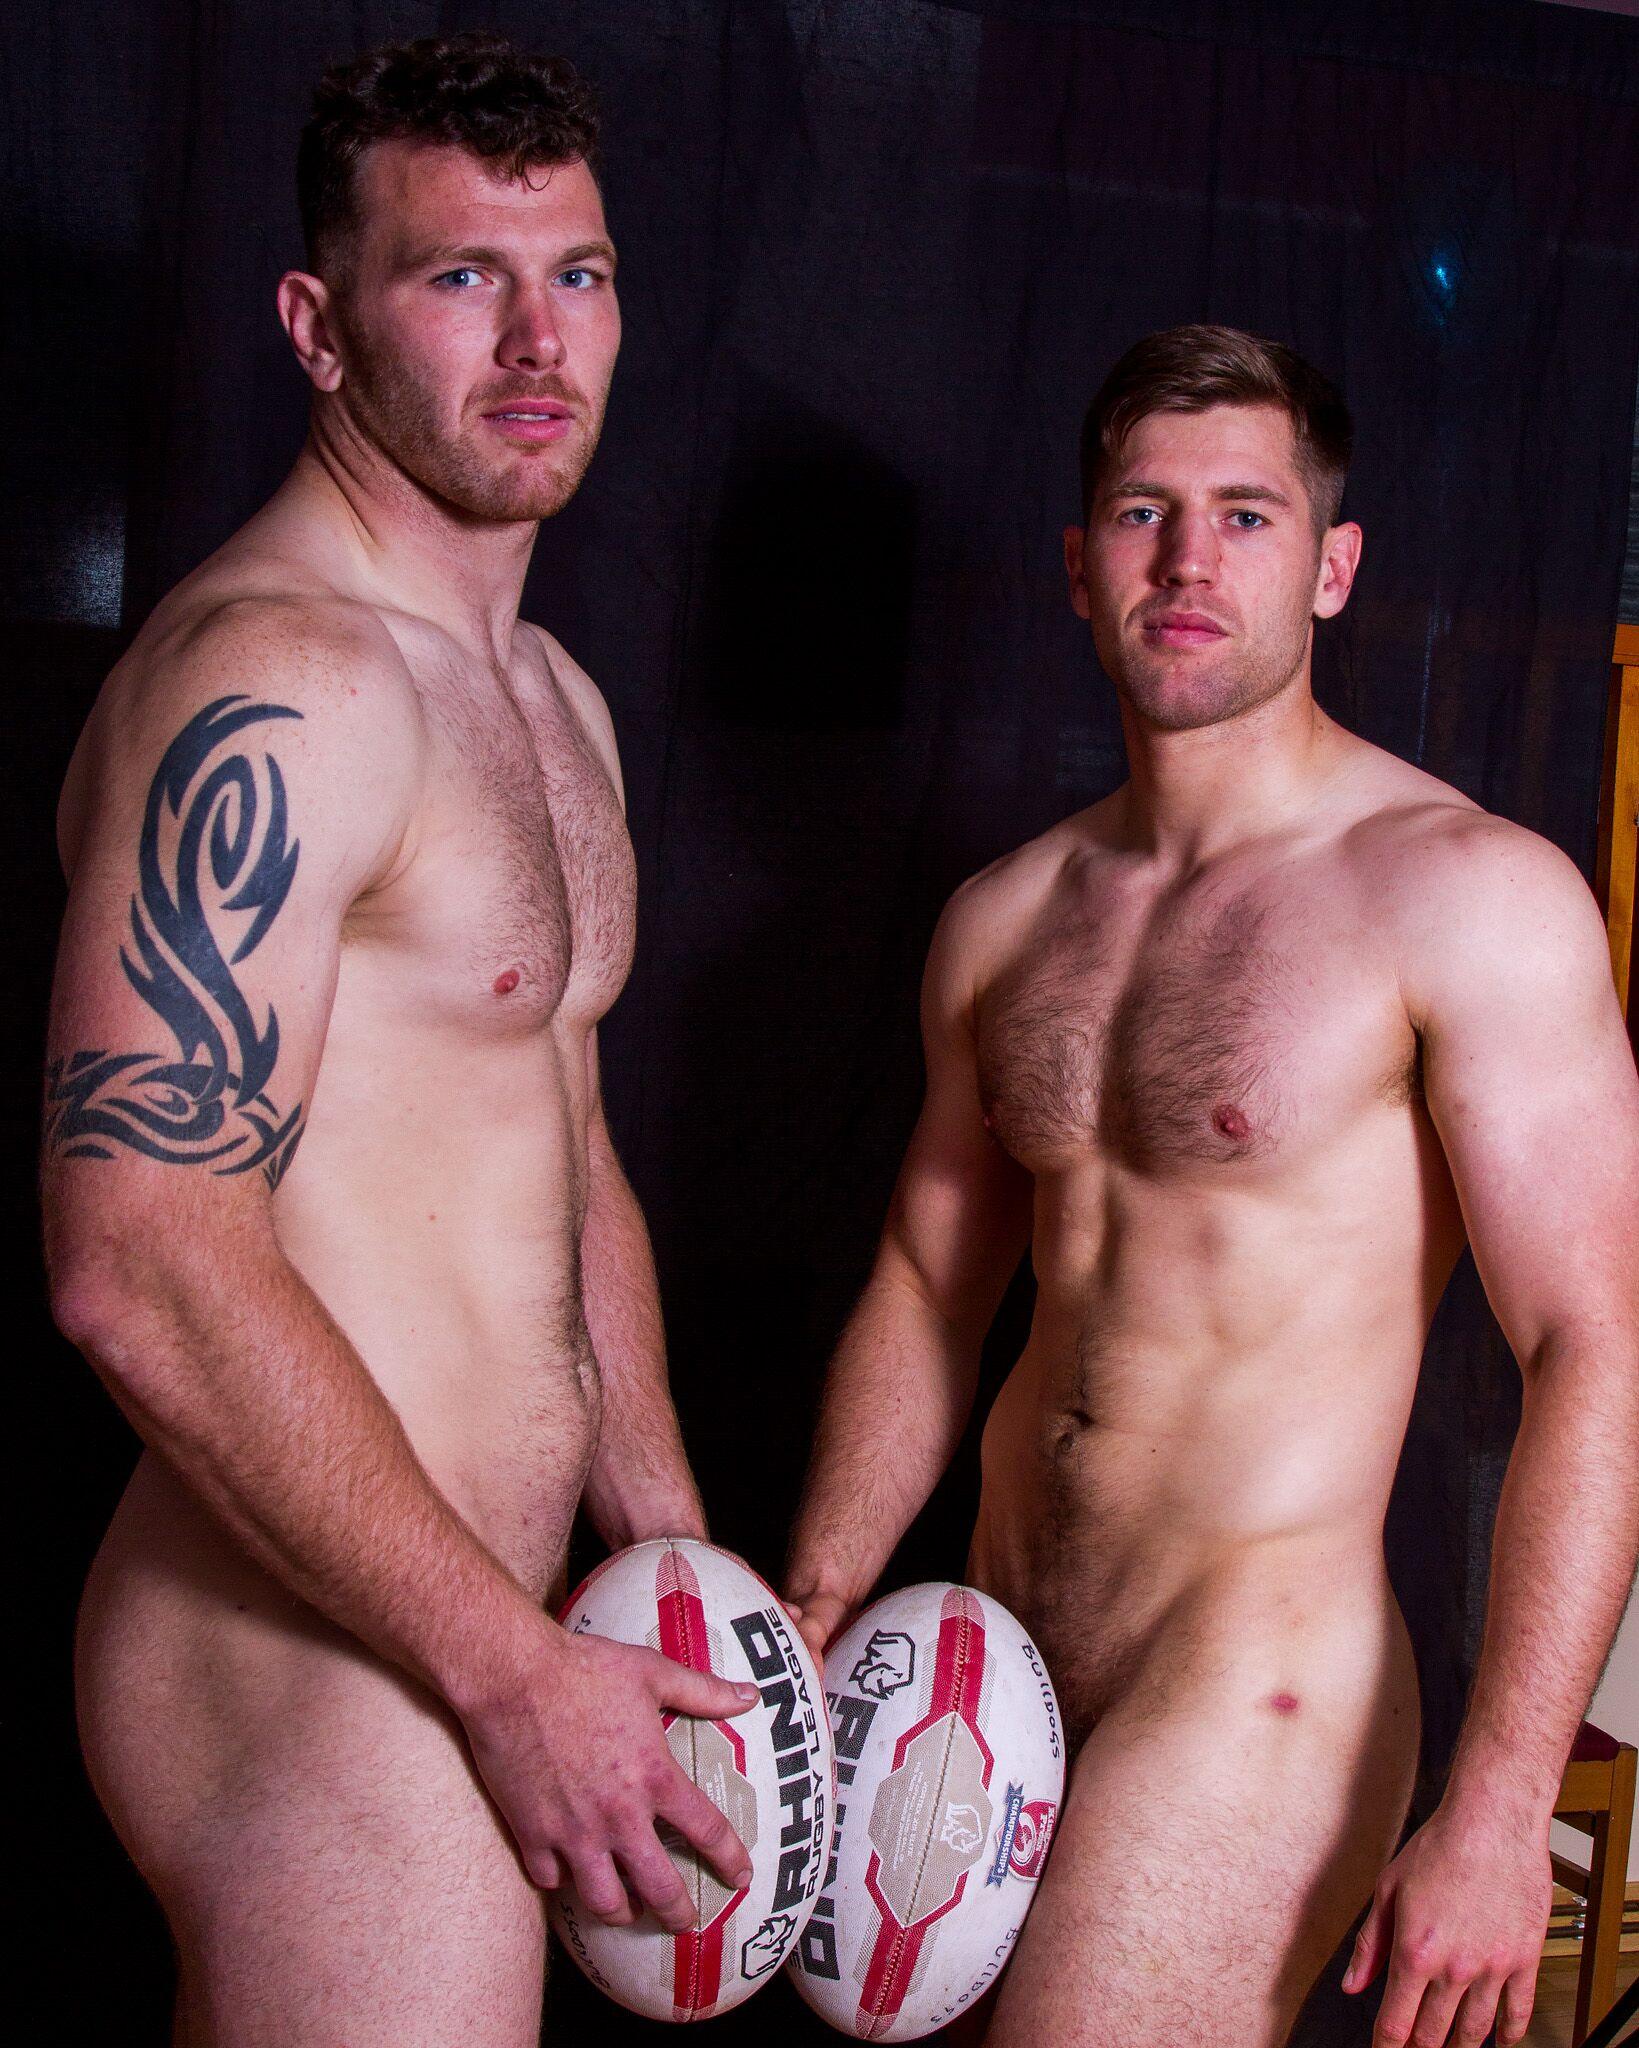 Nude professional sportsmen